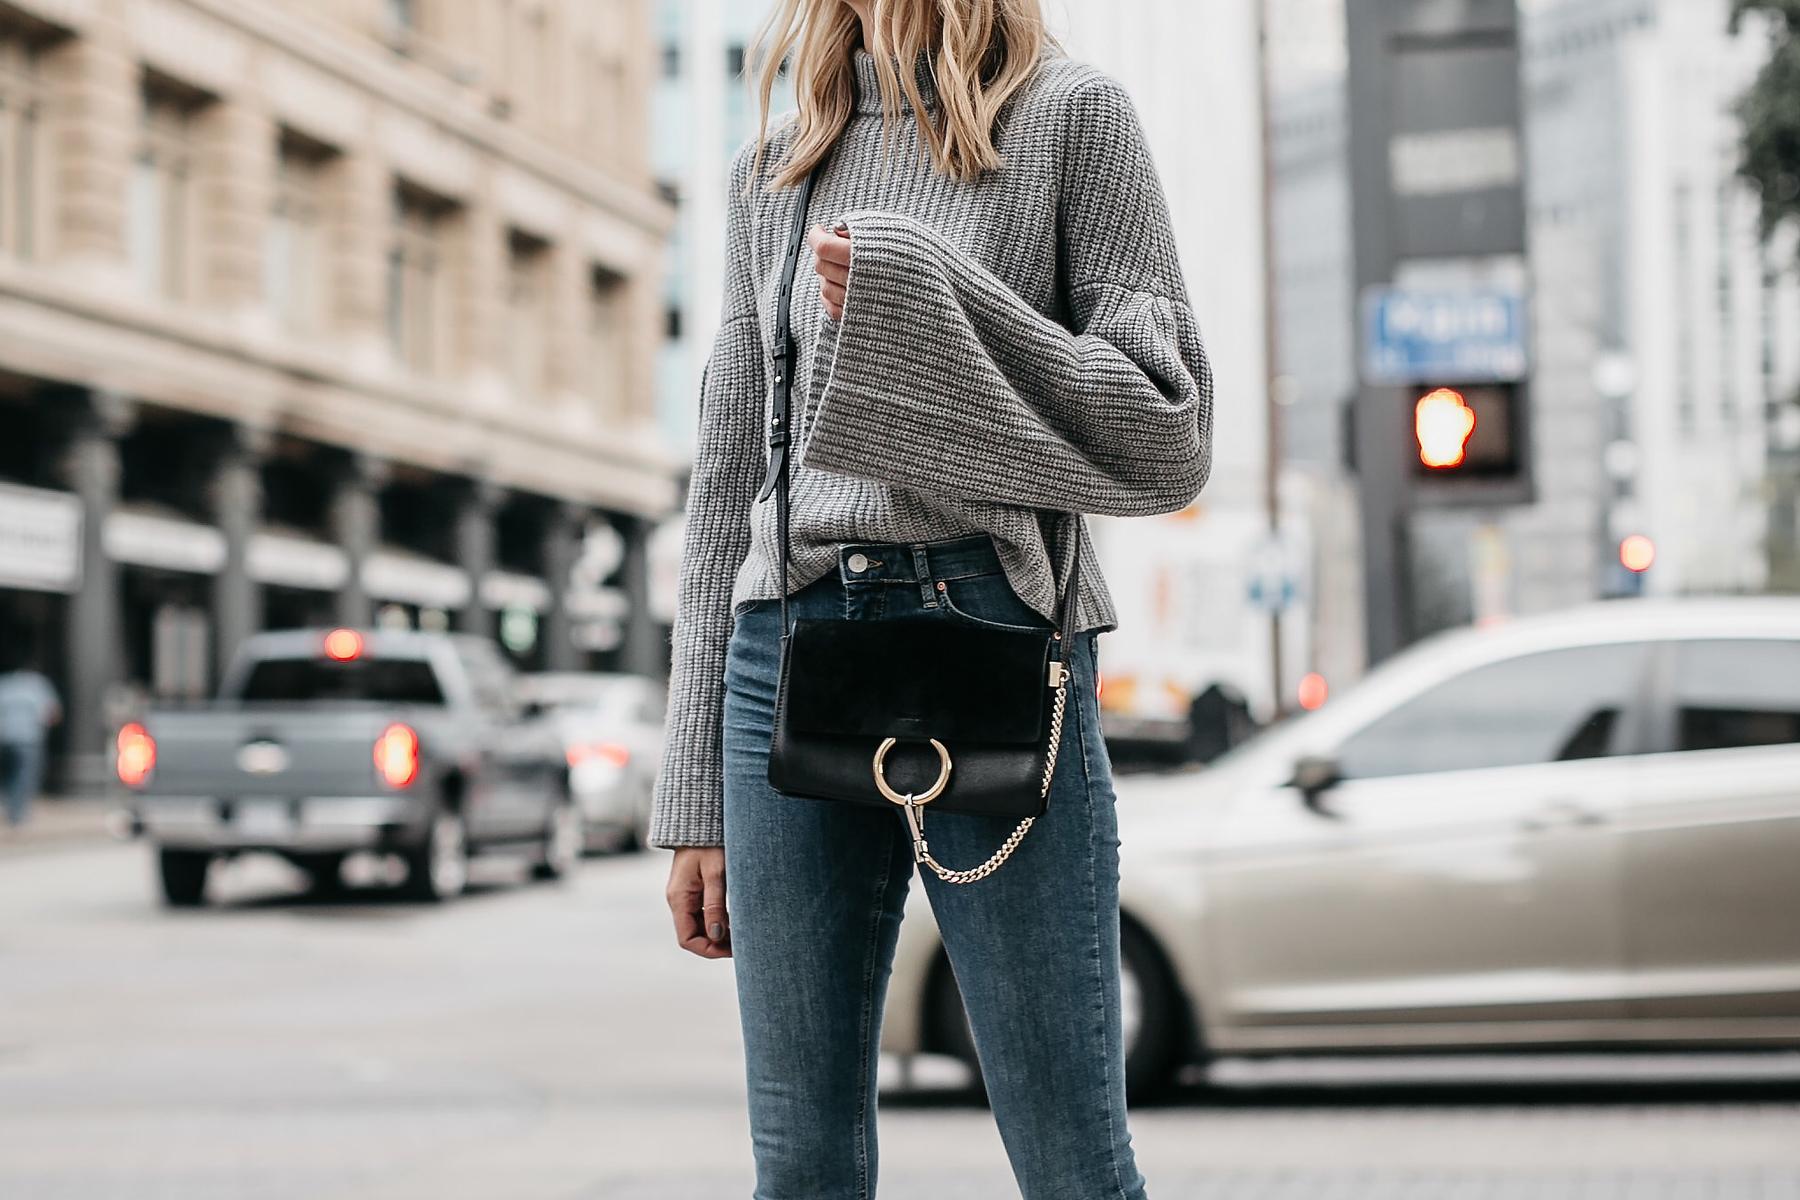 Grey Bell Sleeve Sweater Denim Skinny Jeans Chloe Faye Black Handbag Fashion Jackson Dallas Blogger Fashion Blogger Street Style